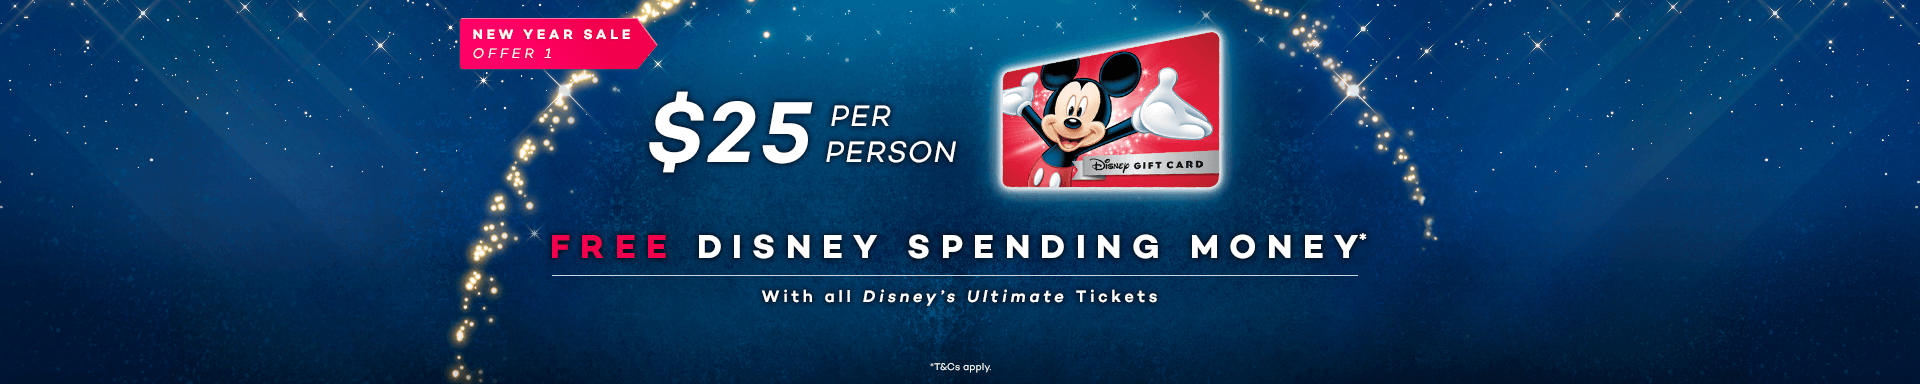 25 disney spending money per person